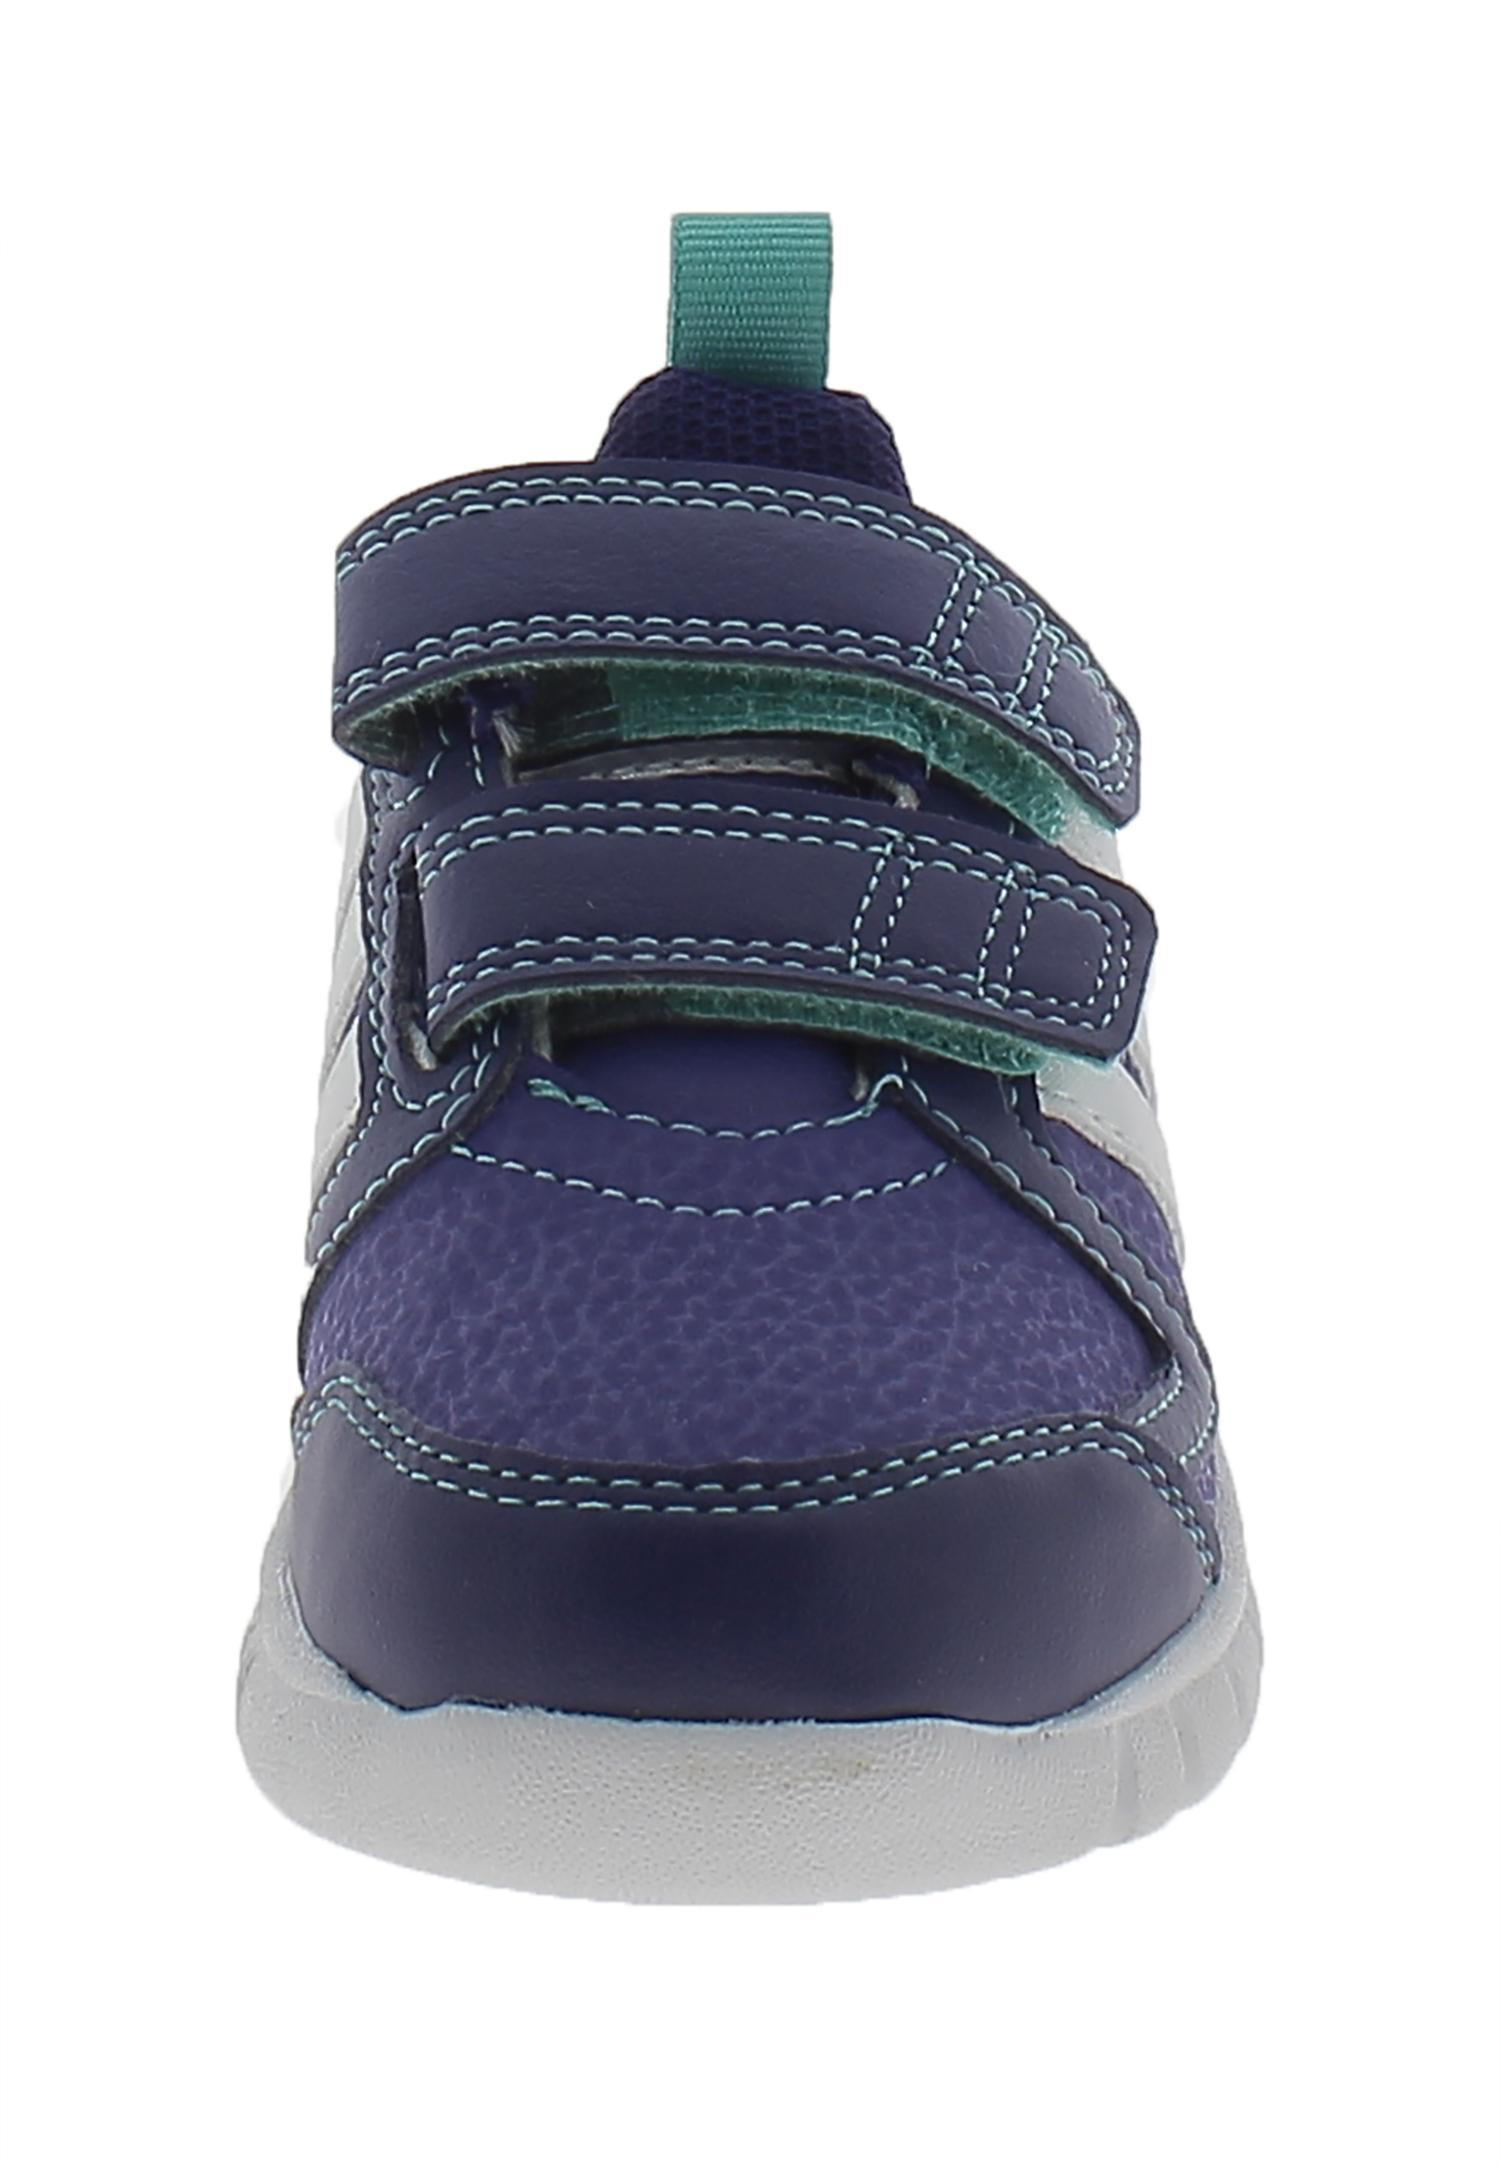 adidas adidas sta fluid 3 cf i scarpe bambina viola pelle strappi m25492